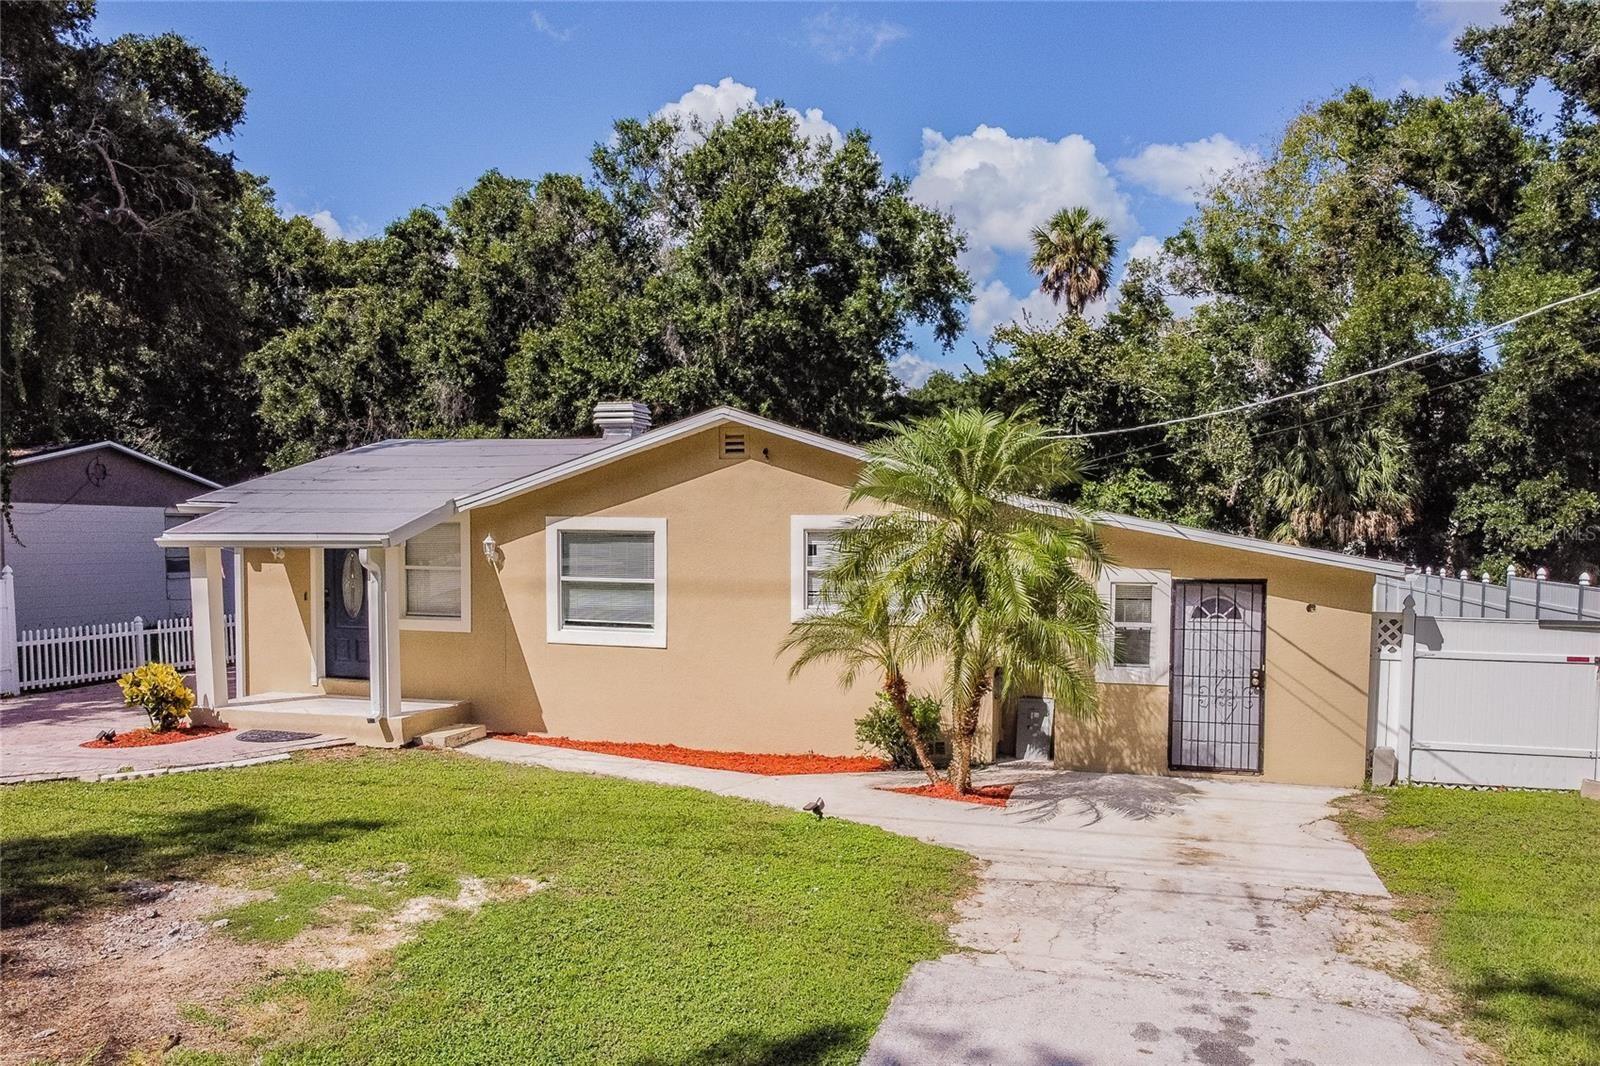 8507 SUNBEAM LANE, Tampa, FL 33615 - MLS#: T3334803